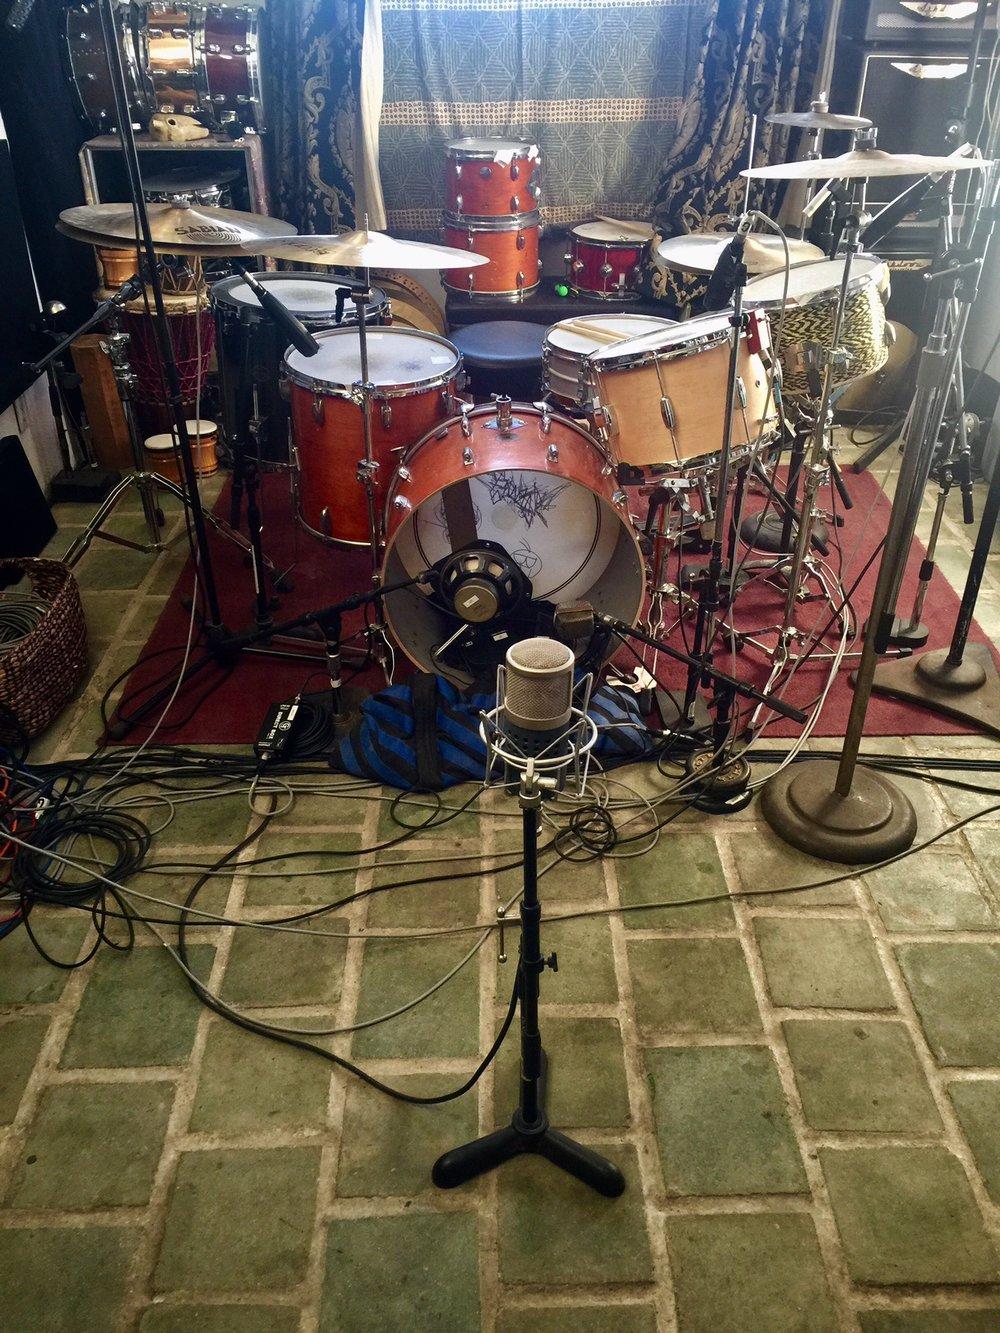 racho-de-la-luna-drums-se-gemini